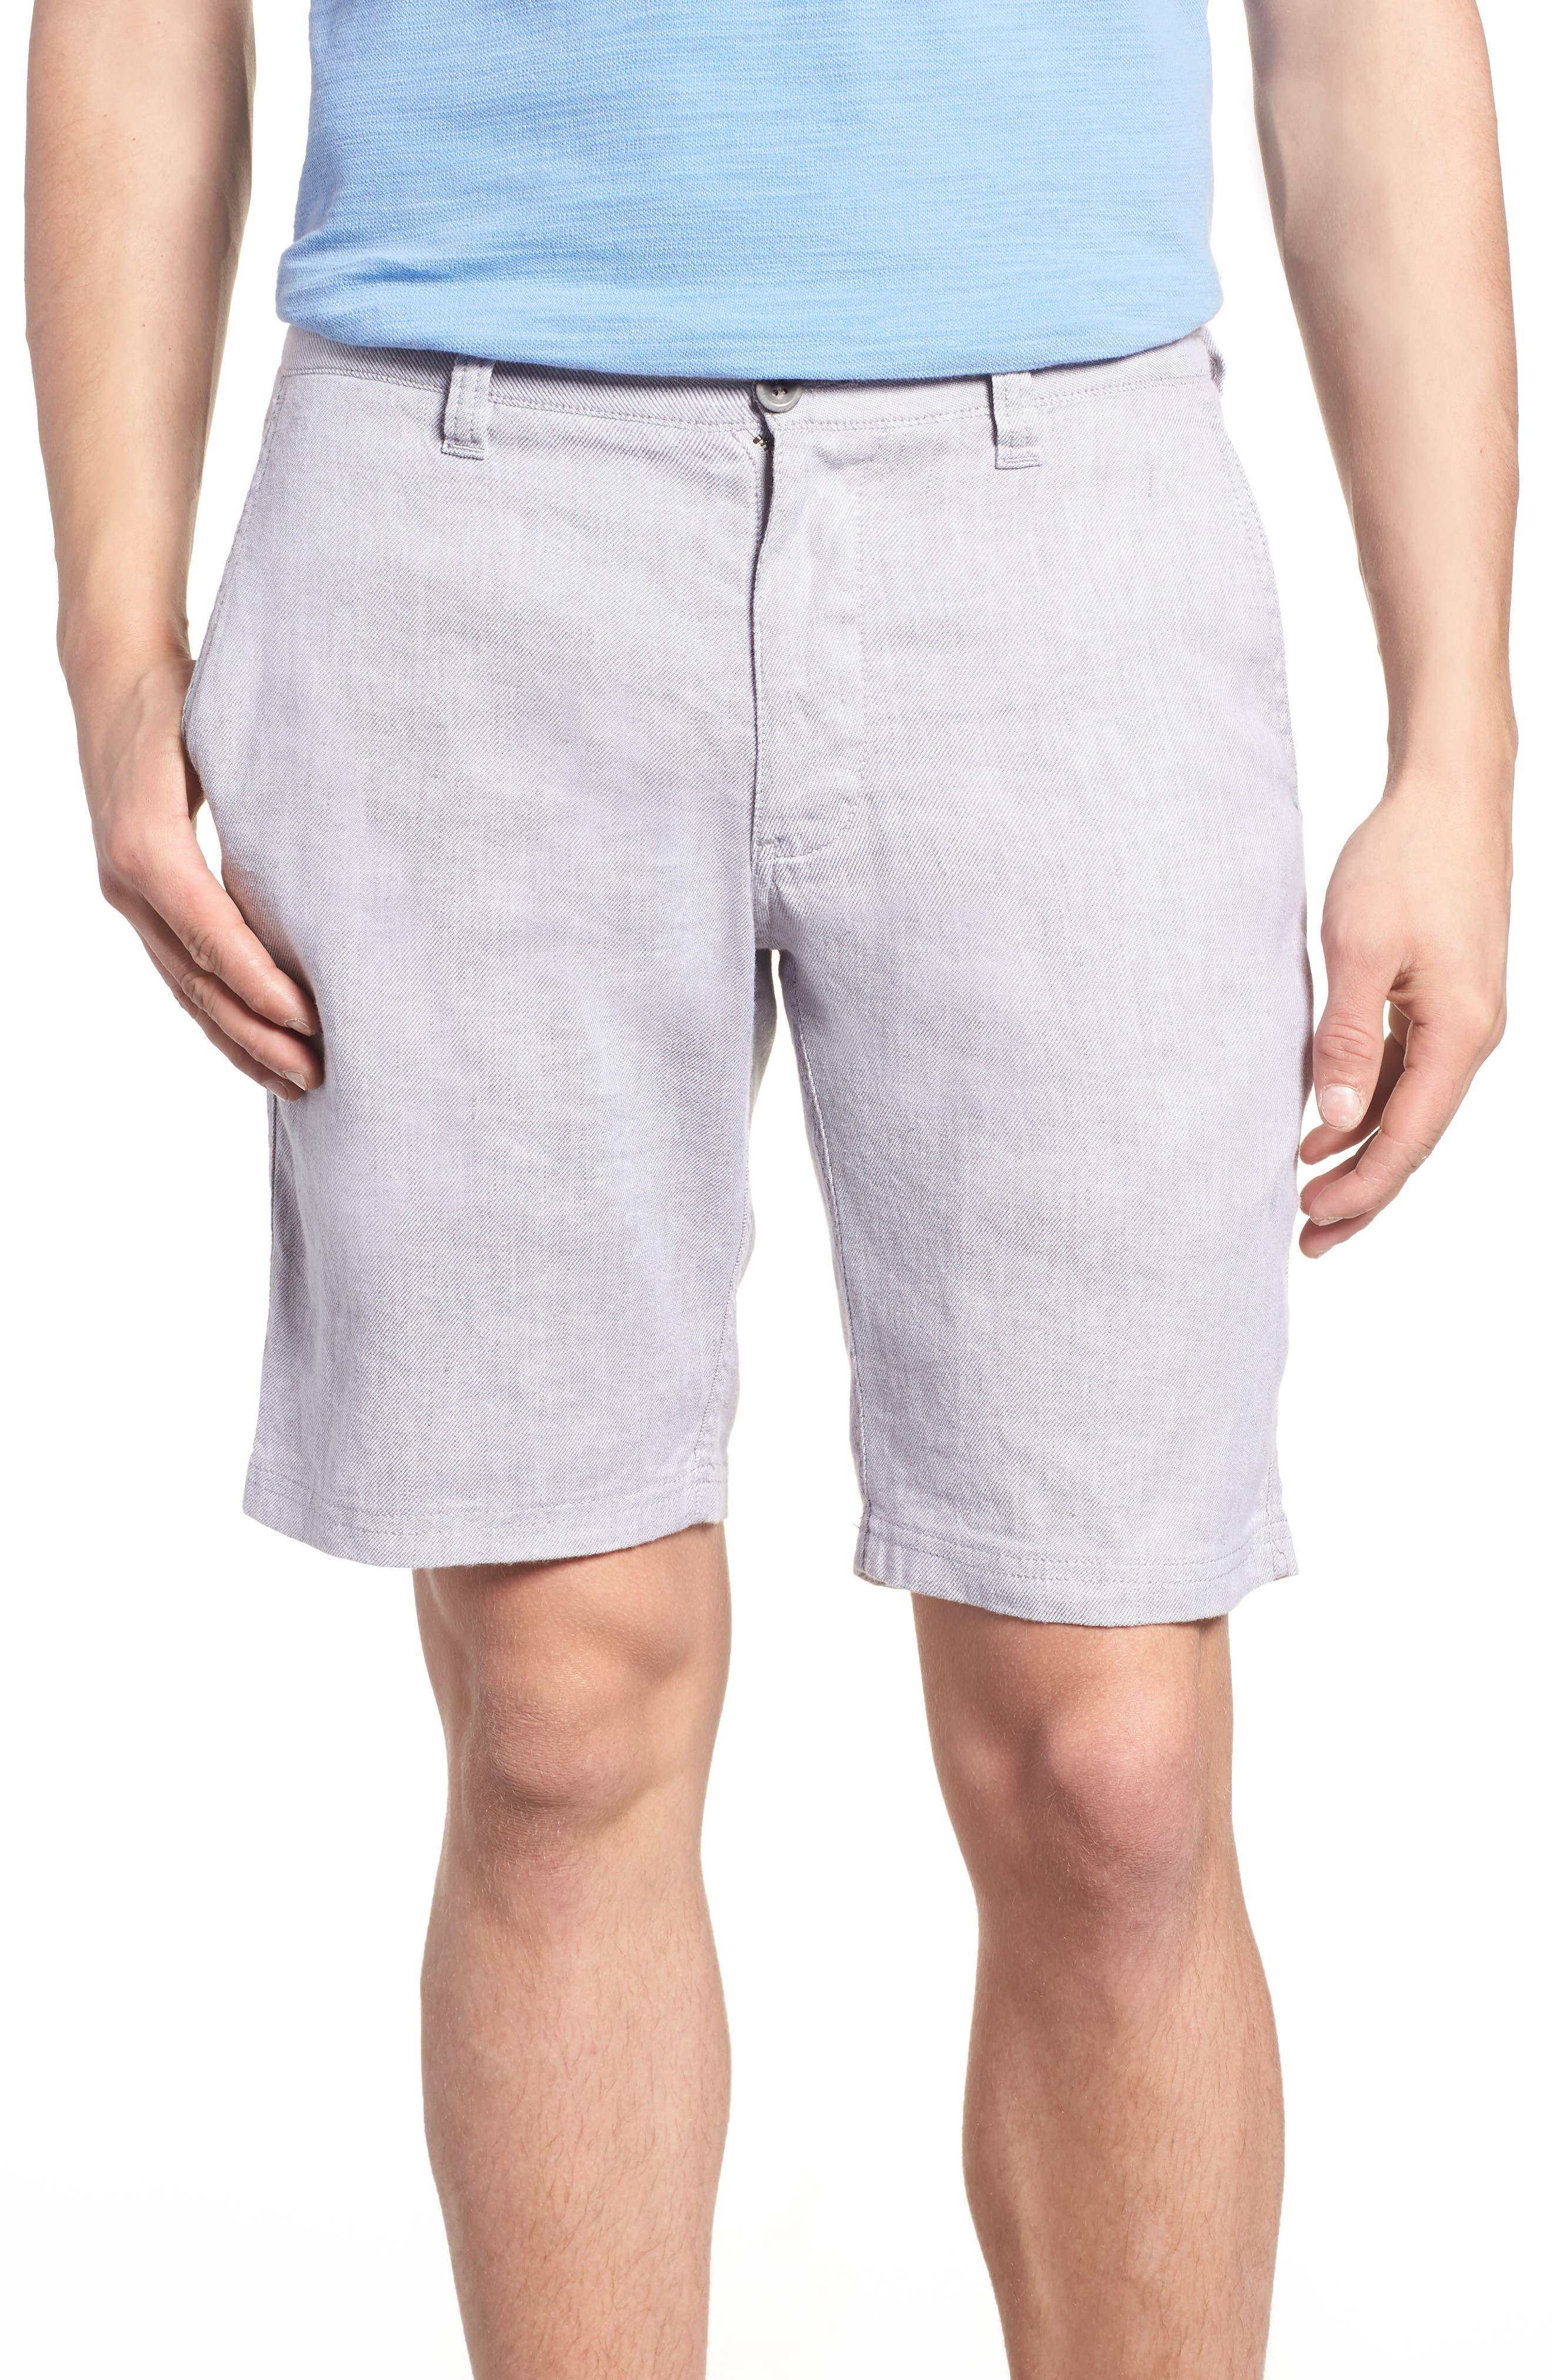 Beach Linen Blend Shorts,                             Main thumbnail 1, color,                             Storm Gray